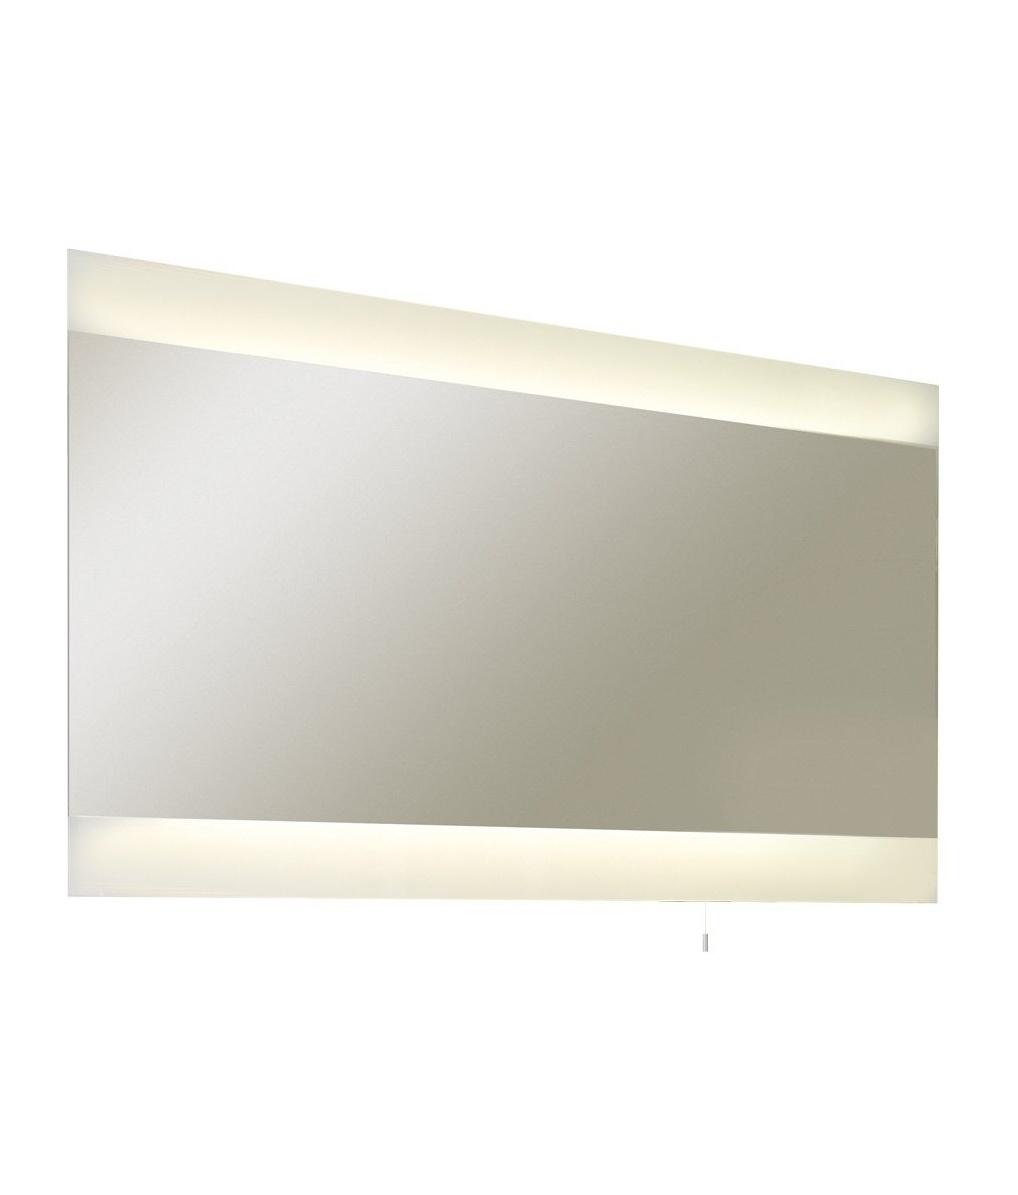 wide illuminated bathroom mirror